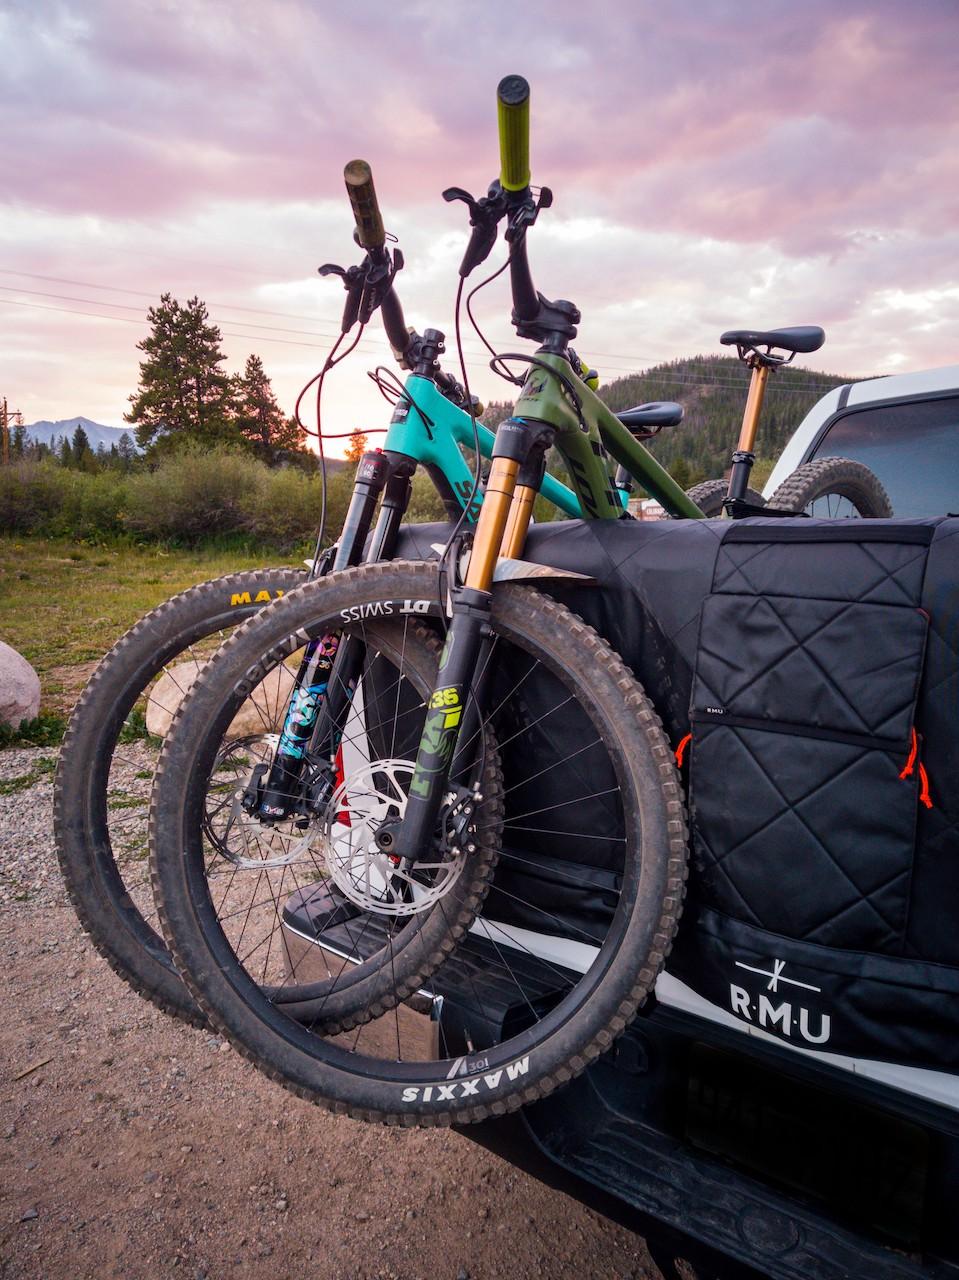 First-Look-The-Ultimate-MTB-Kit-RMU-TG-bikes-in-truck